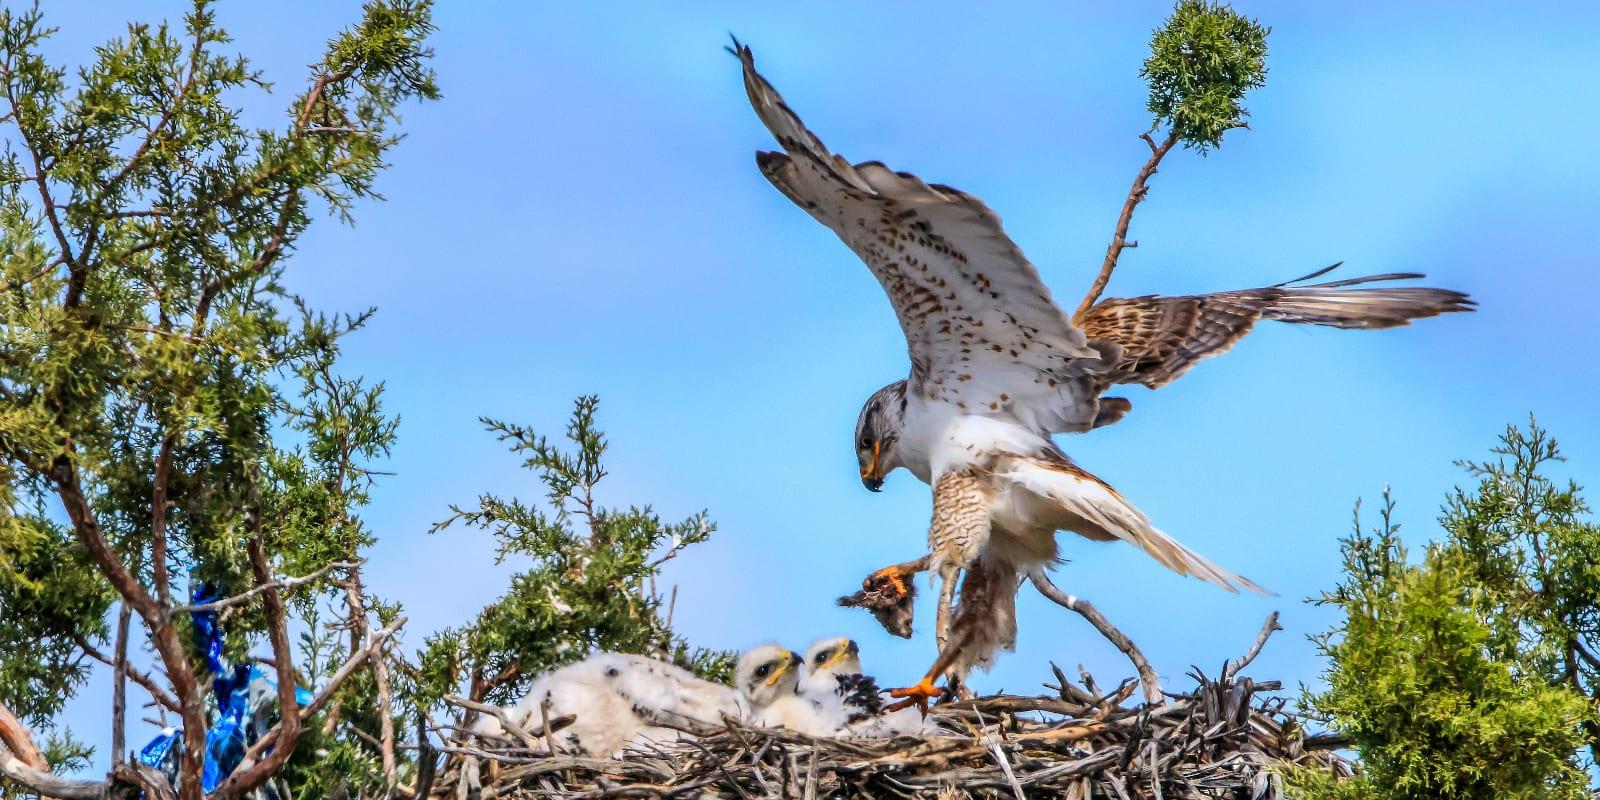 Ferruginous Hawk on Nest